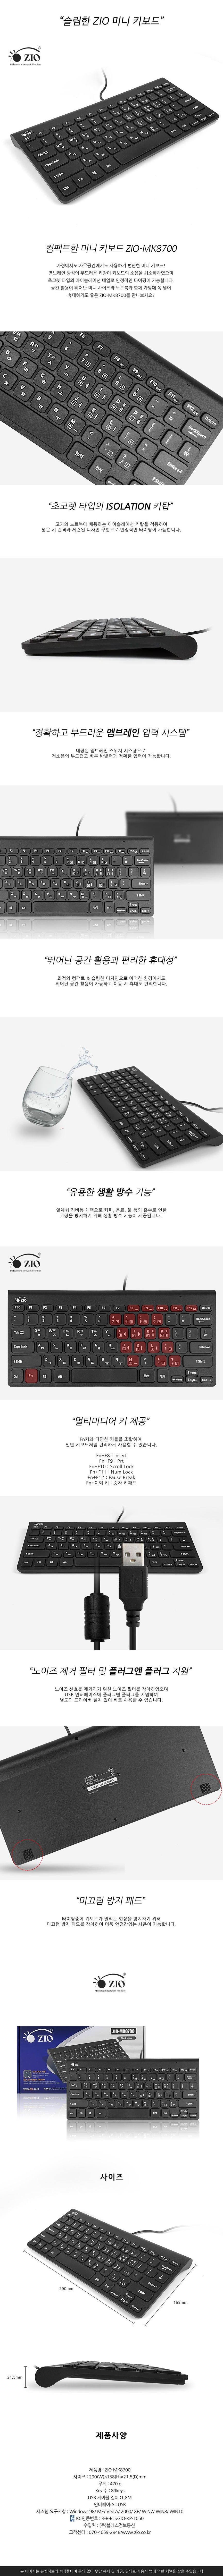 Bless ZIO MK8700 미니 키보드